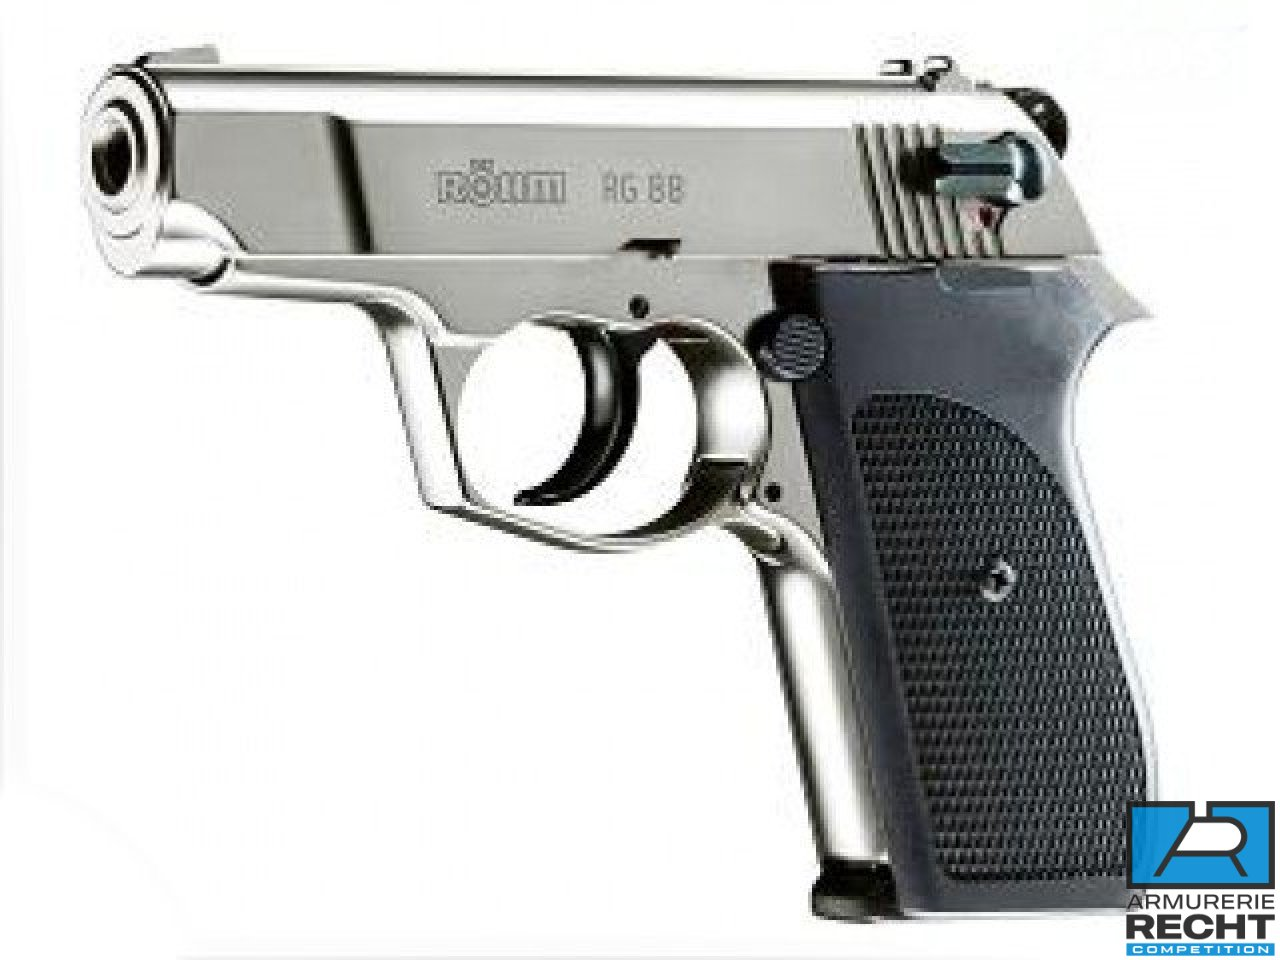 pistolet rohm rg88 cal 9mmpa blanc armes neuves. Black Bedroom Furniture Sets. Home Design Ideas